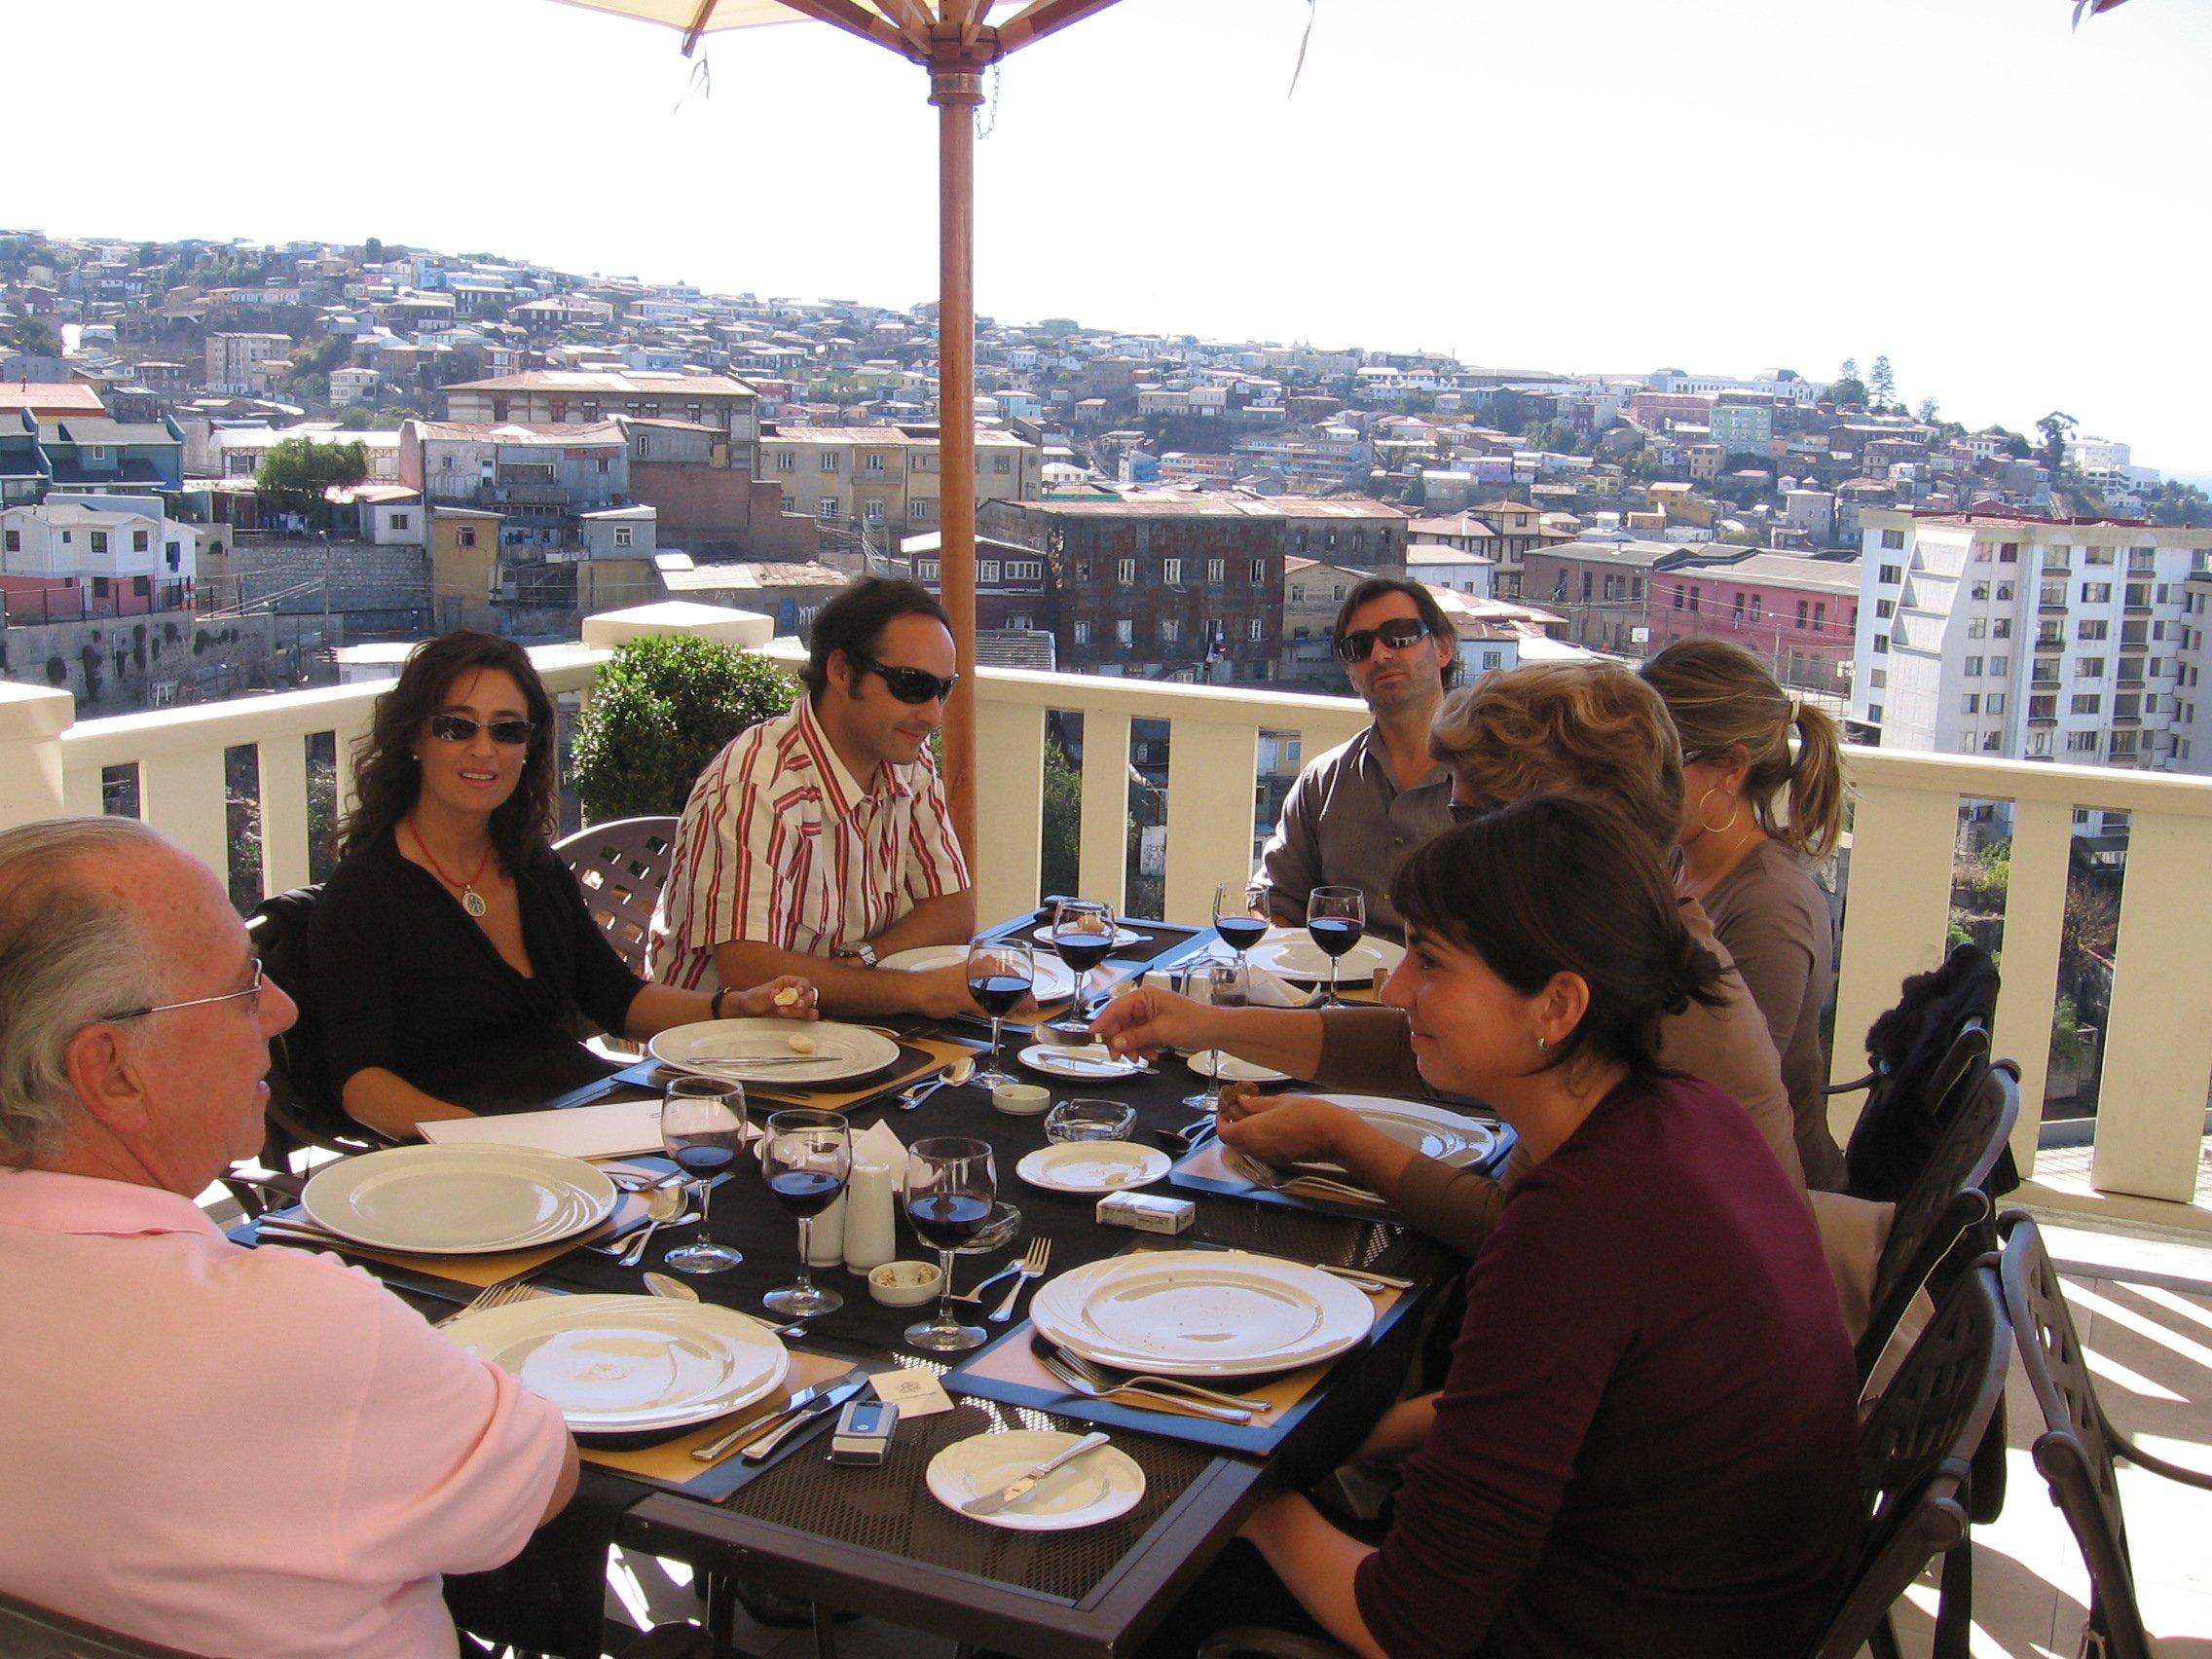 Grupo almorzando en Restaurante Maralegre del Hotel Casa Higueras en Valparaíso